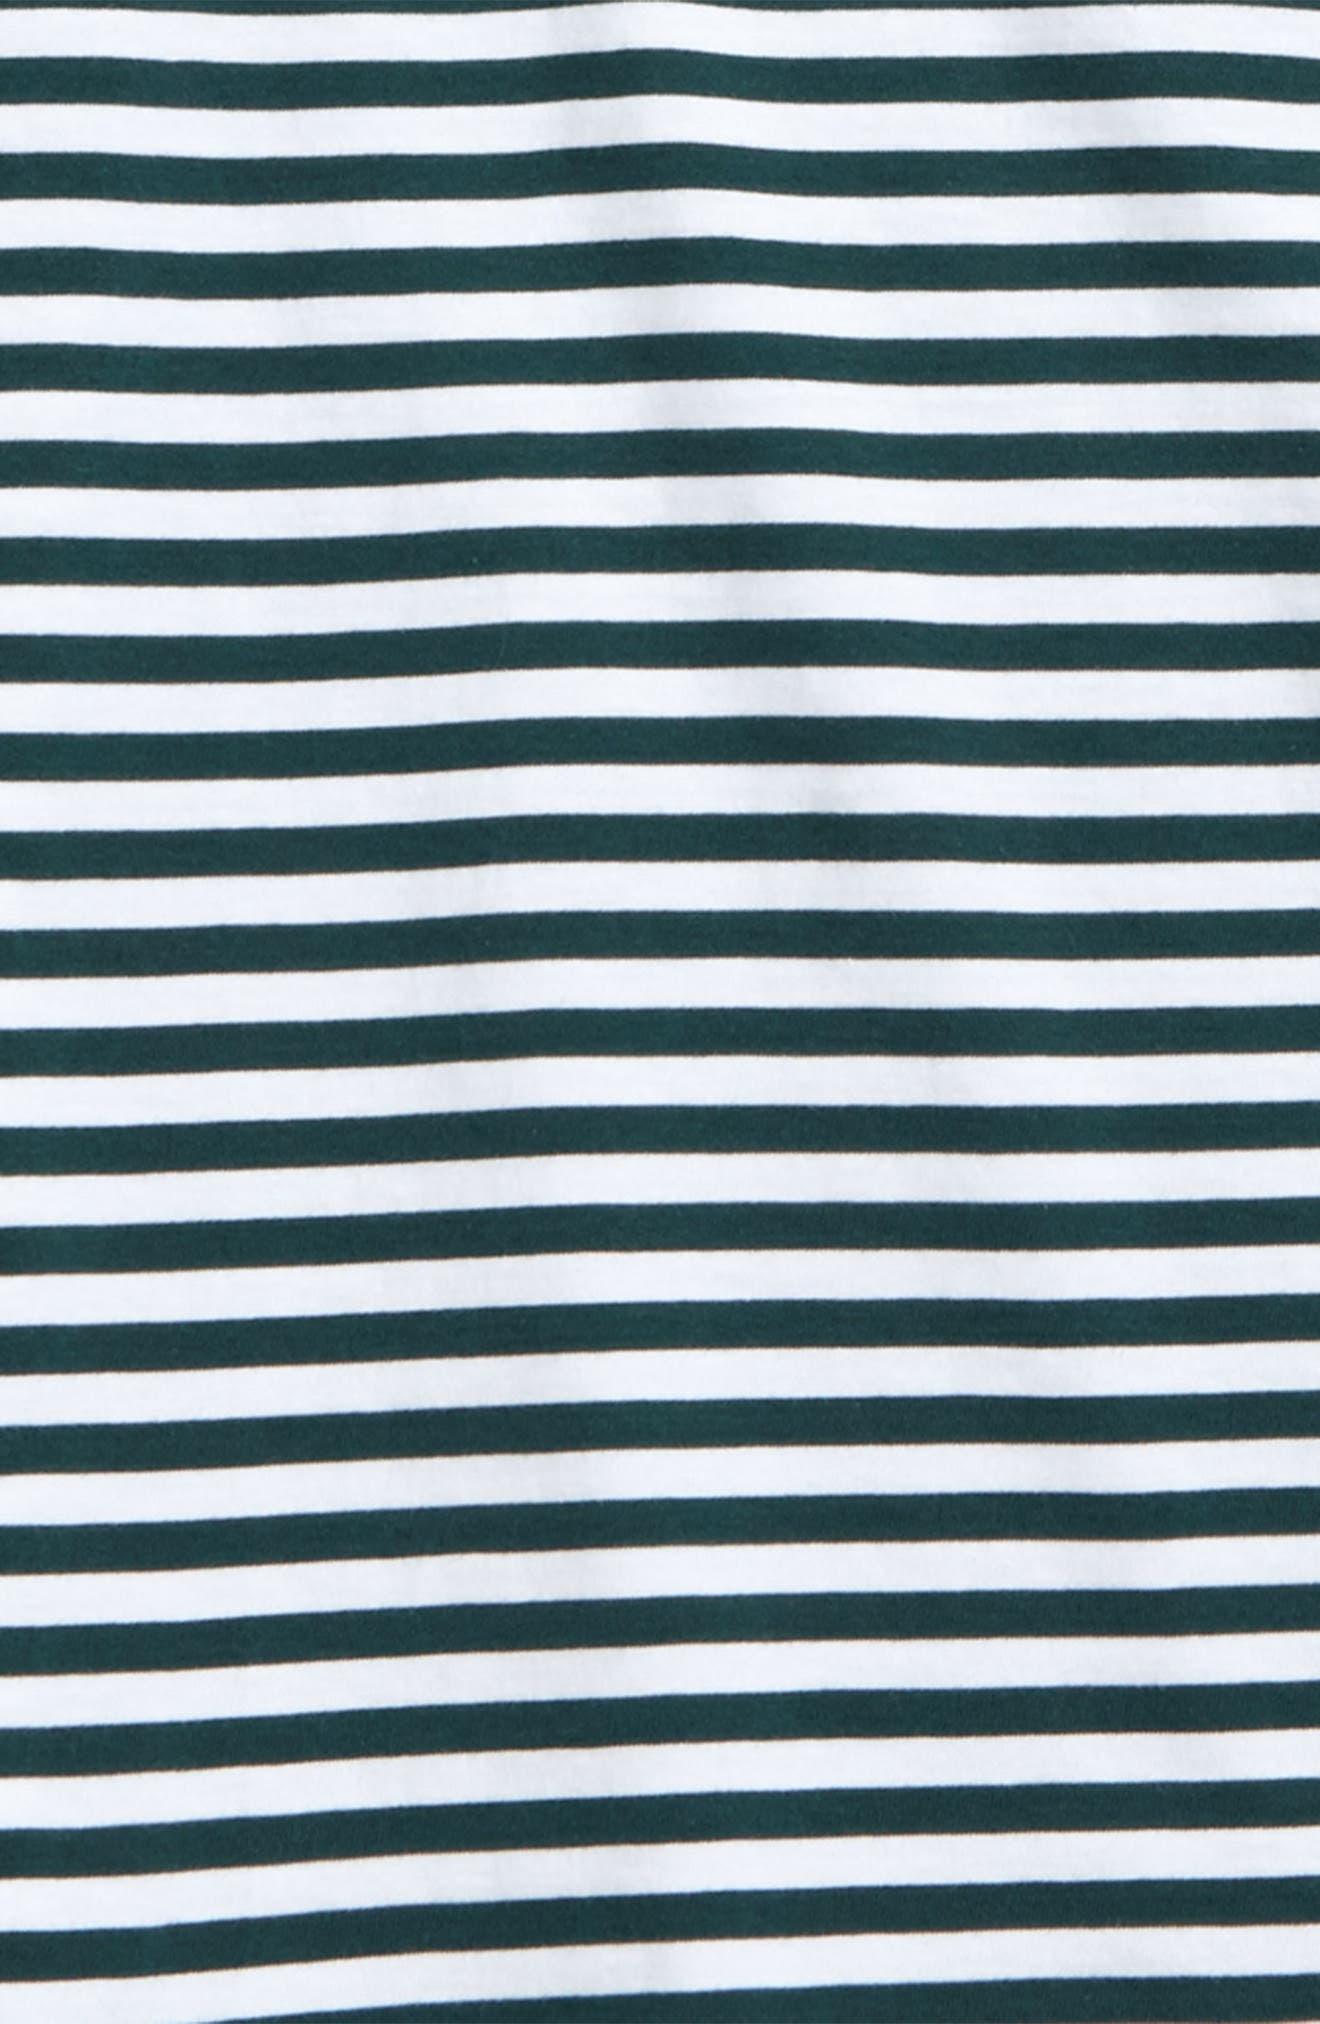 Stripe Long Sleeve Polo,                             Alternate thumbnail 2, color,                             Charleston Green